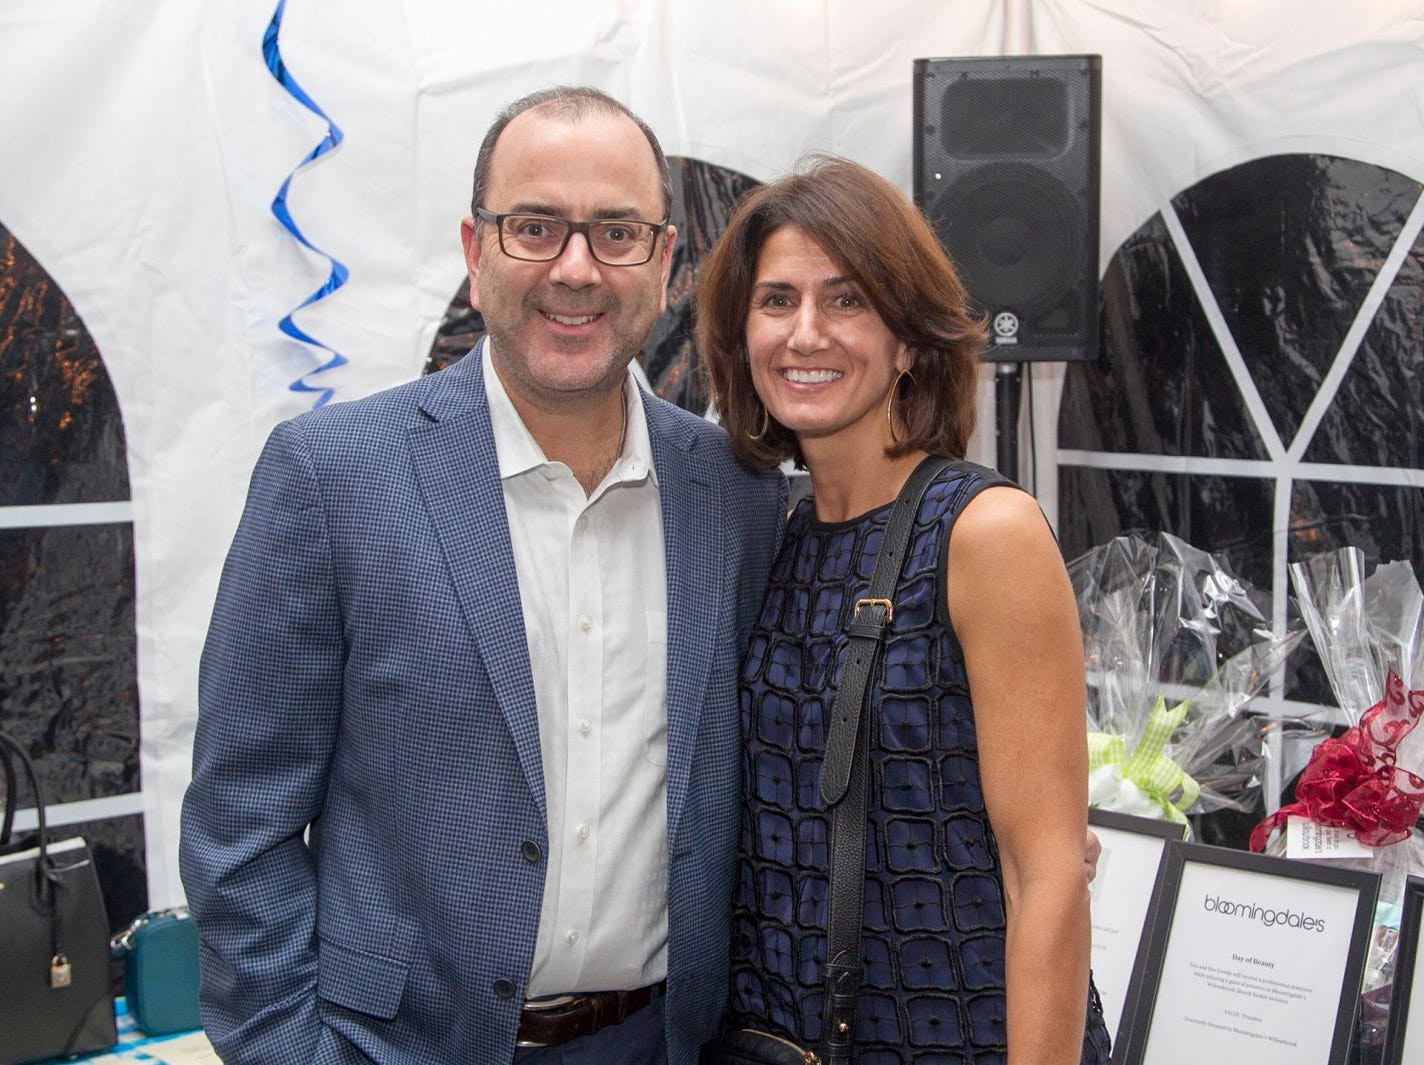 Linda and Mark Hannafey. Ridgewood Education Foundation's 2018 Oktoberfest at the Hermitage. 09/29/2018